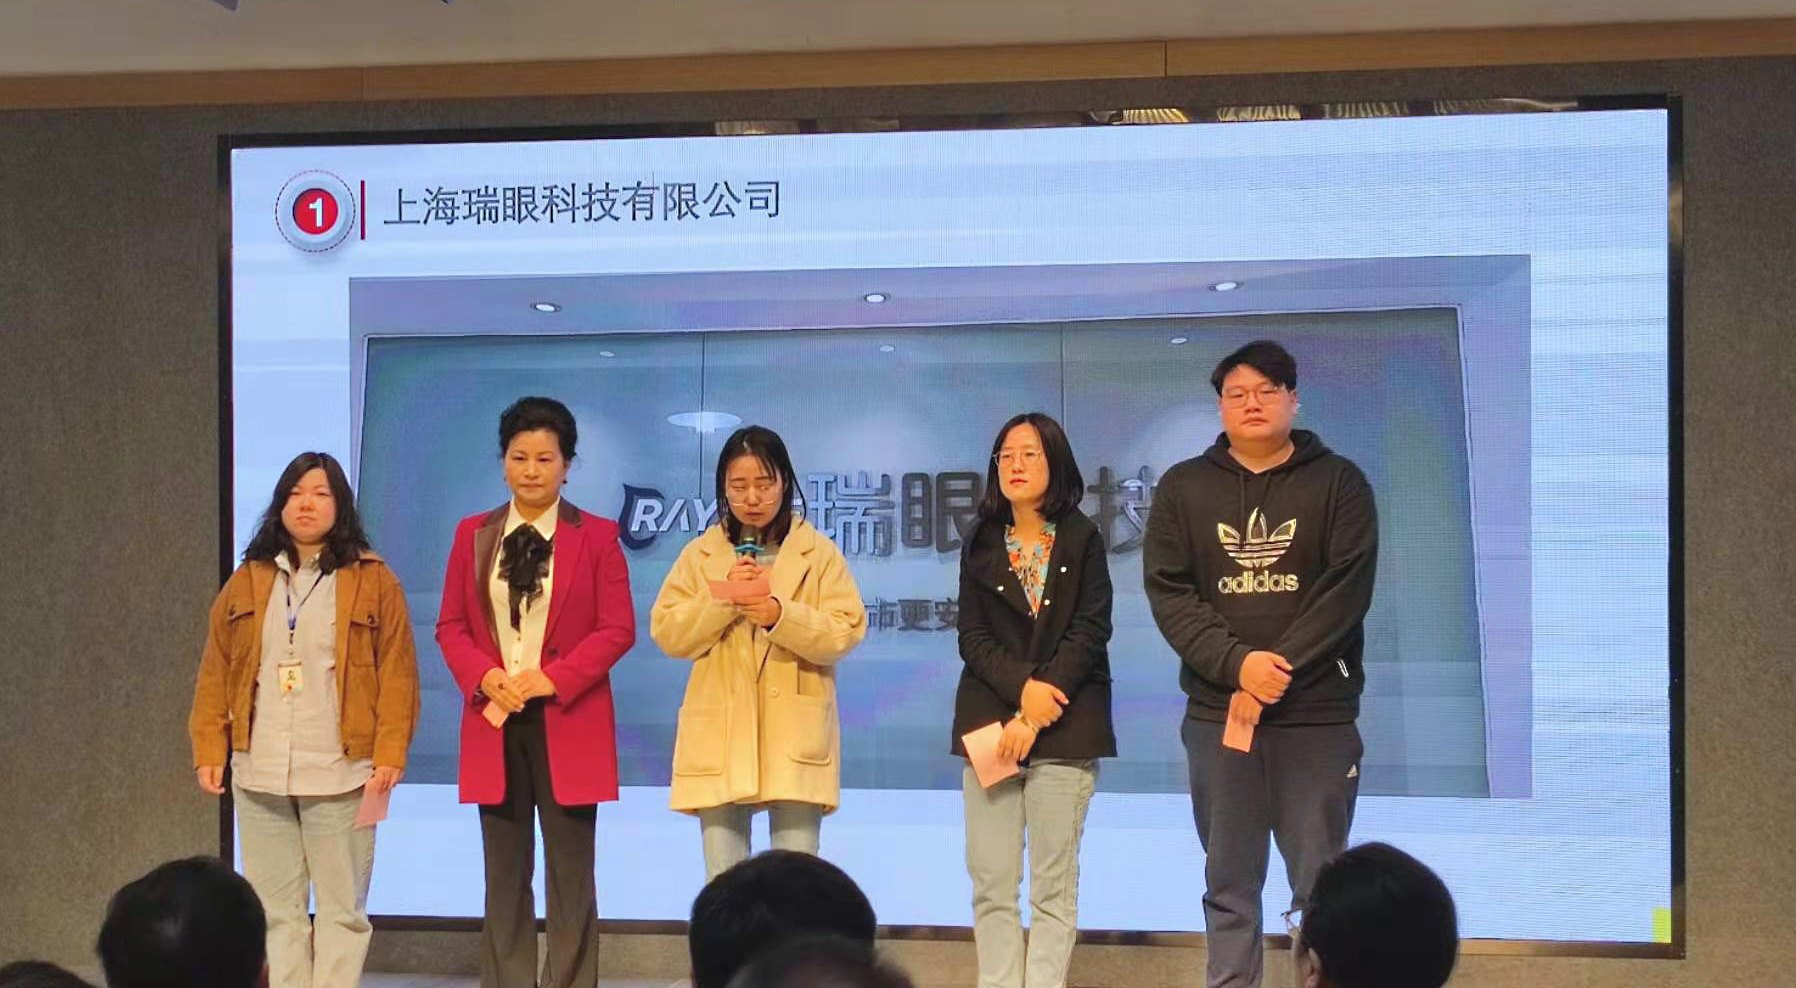 https://timcloud.oss-cn-shanghai.aliyuncs.com/file/iot4/picture/2021/3/25/1616661099004.jpg